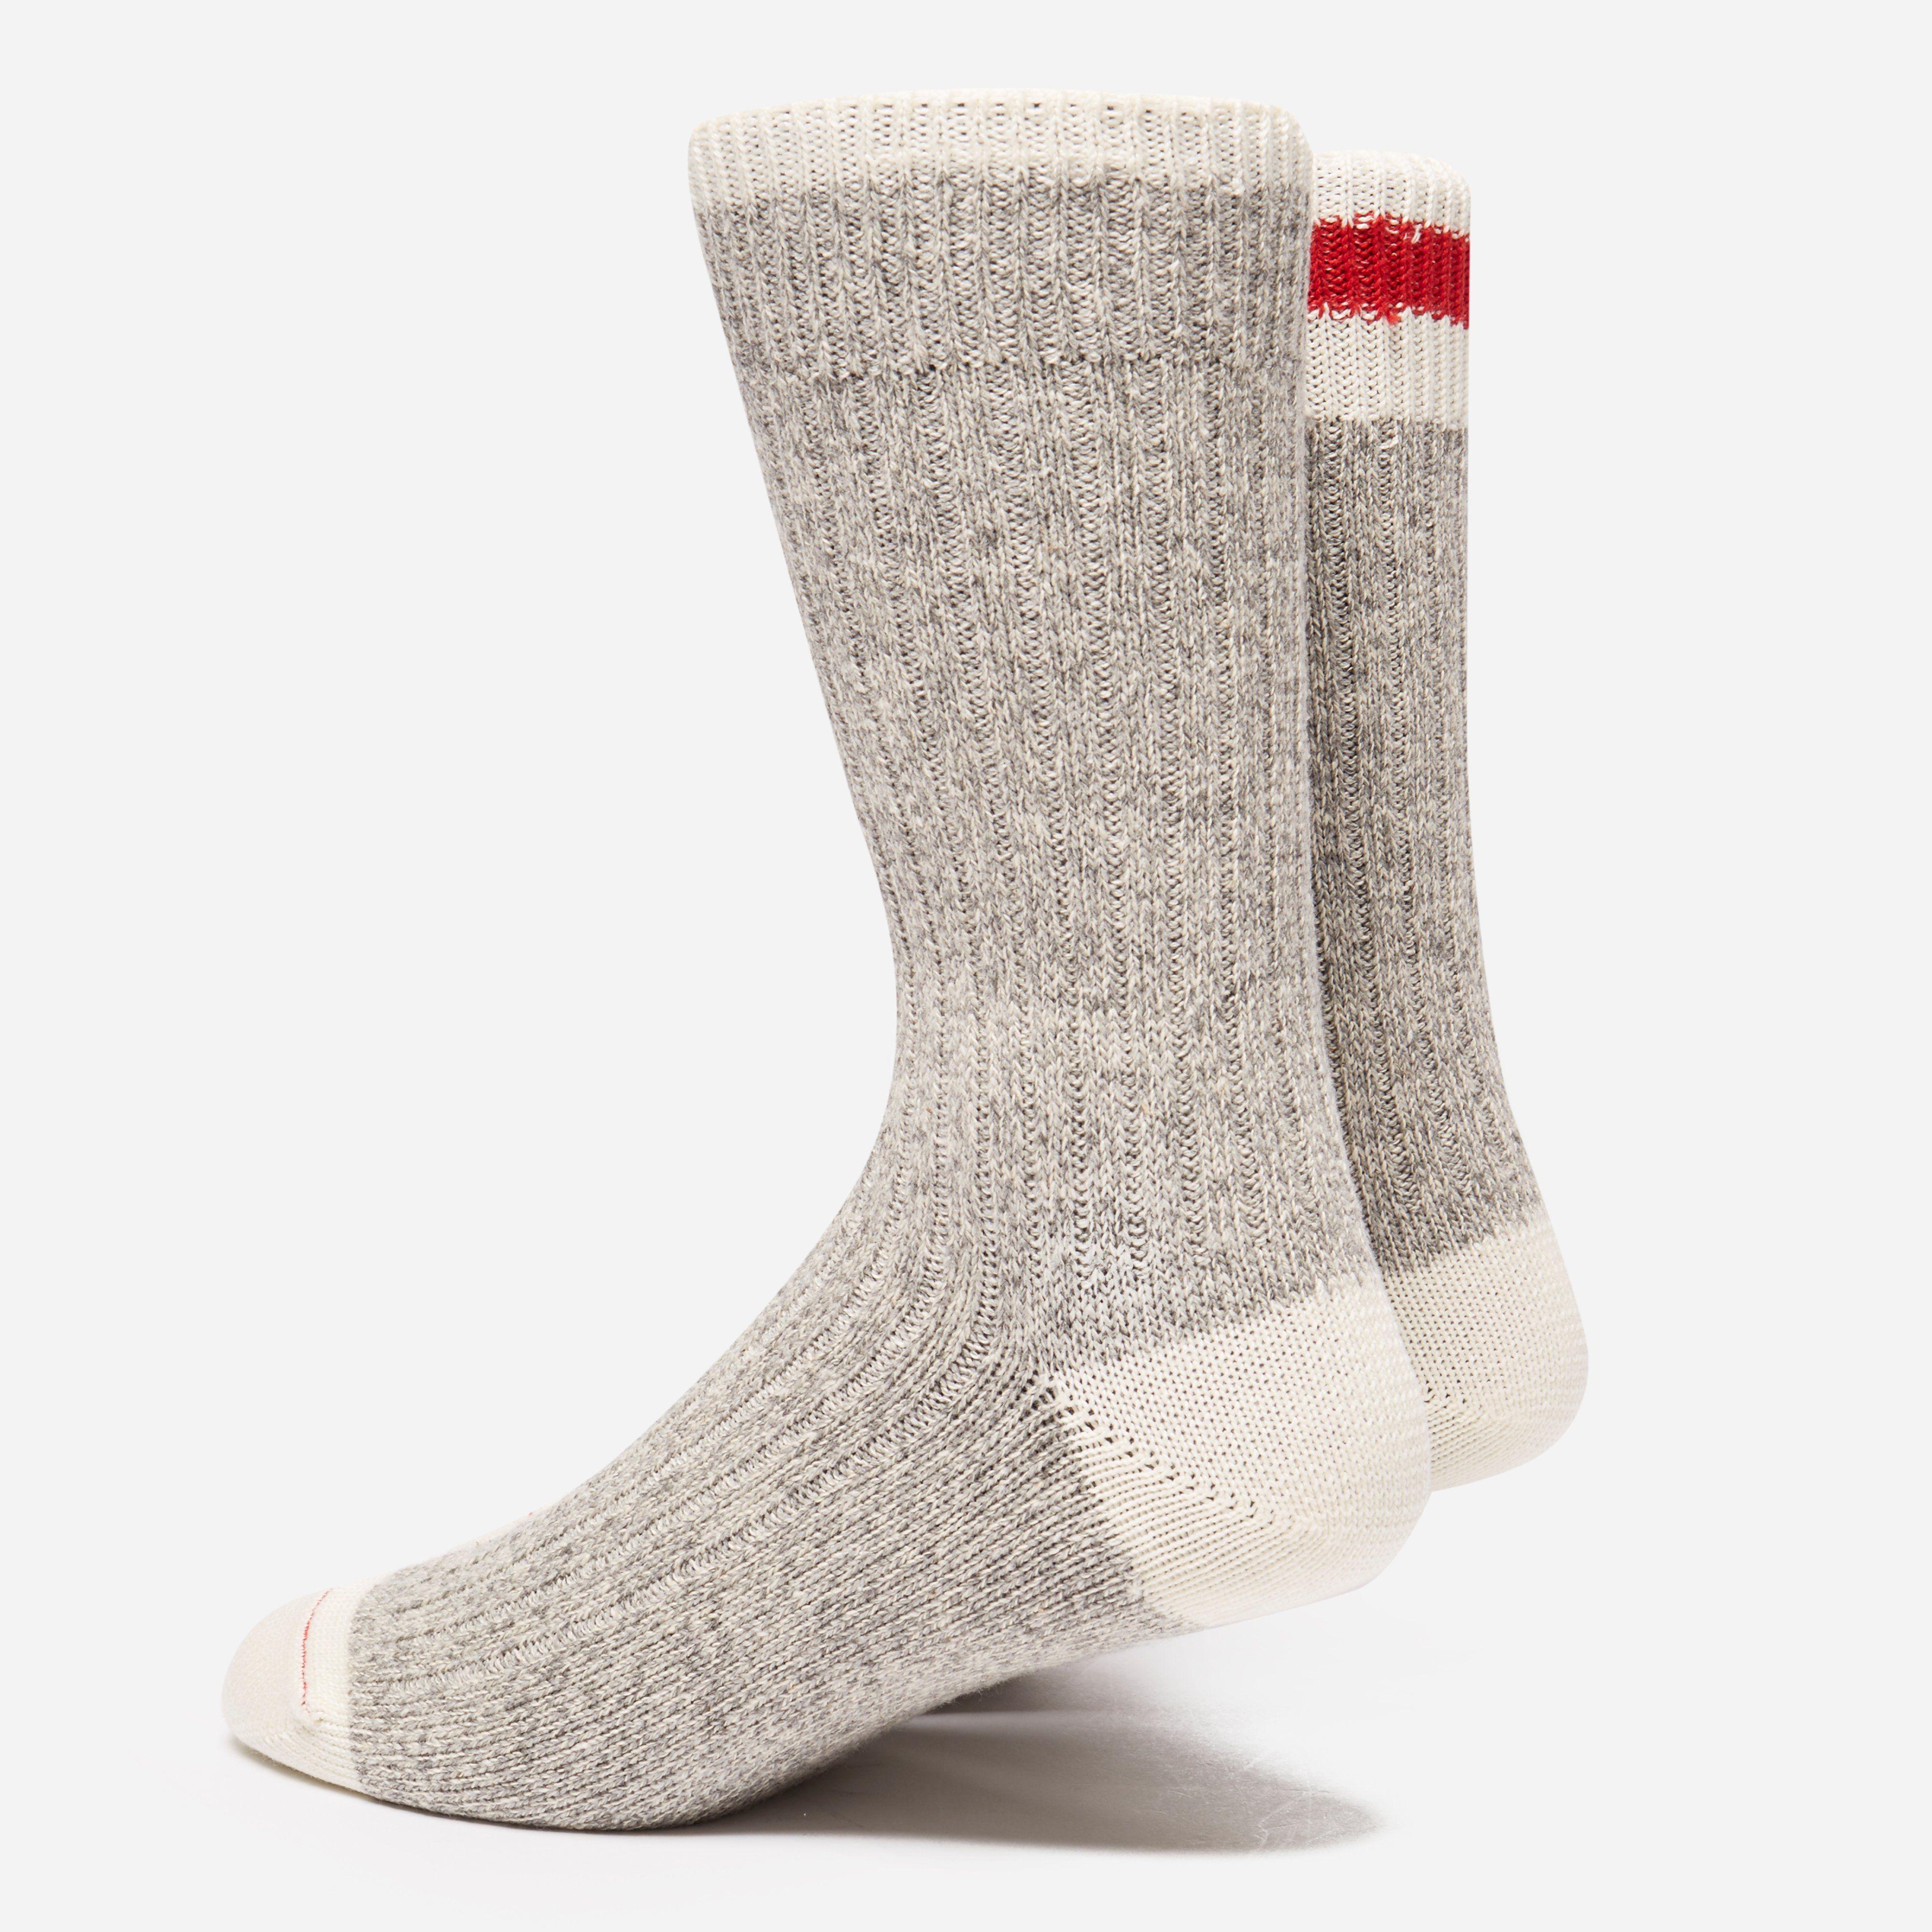 Beams Plus Ragg Socks